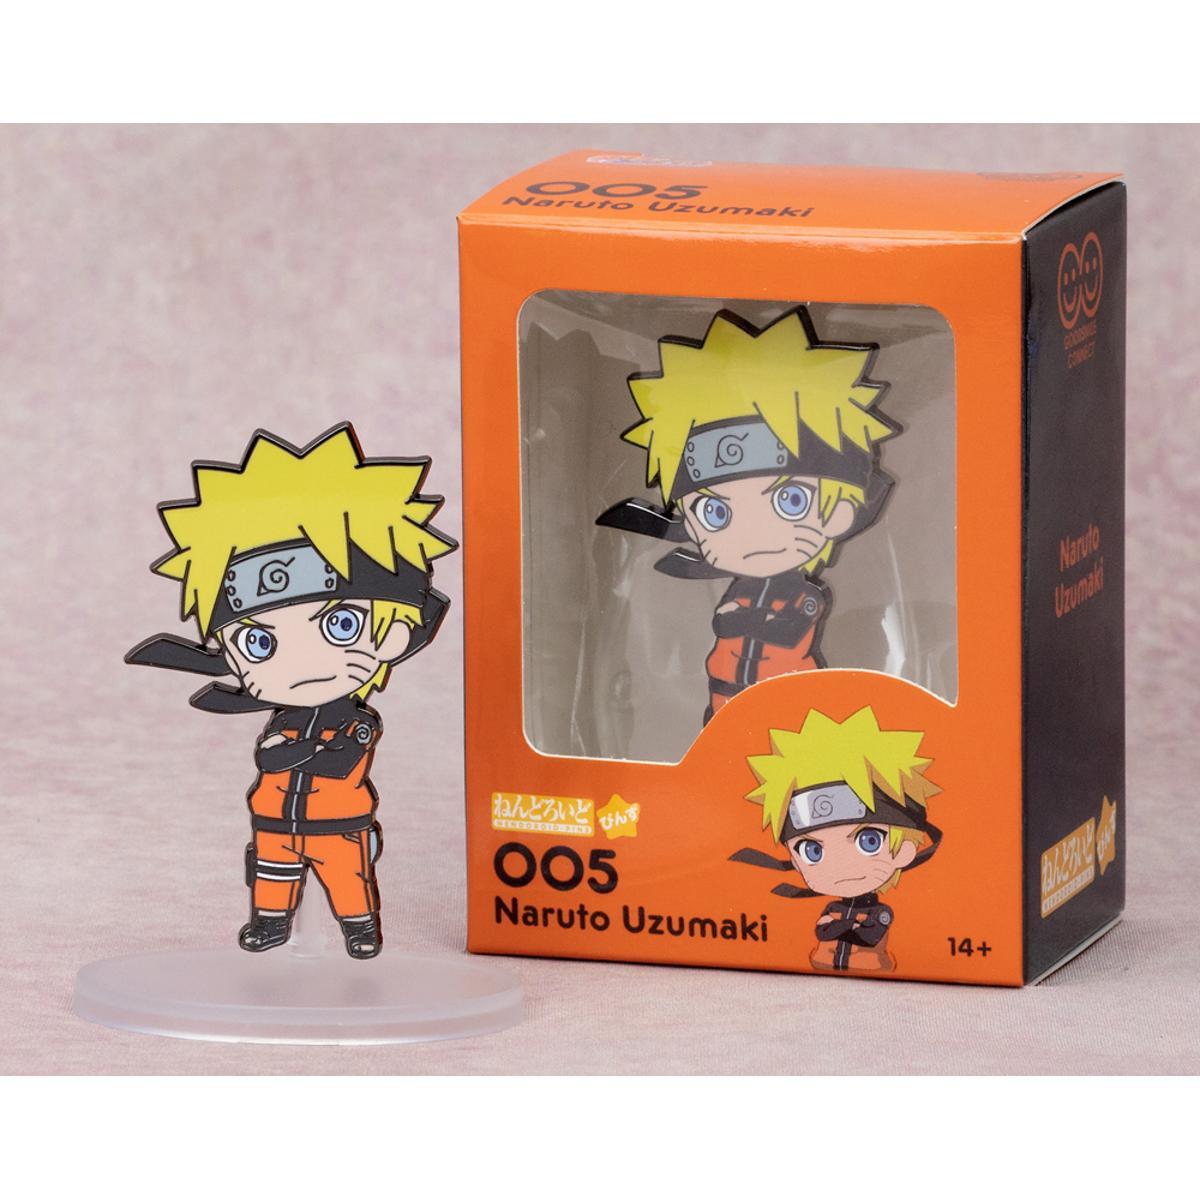 Nendoroid Pin Naruto Uzumaki